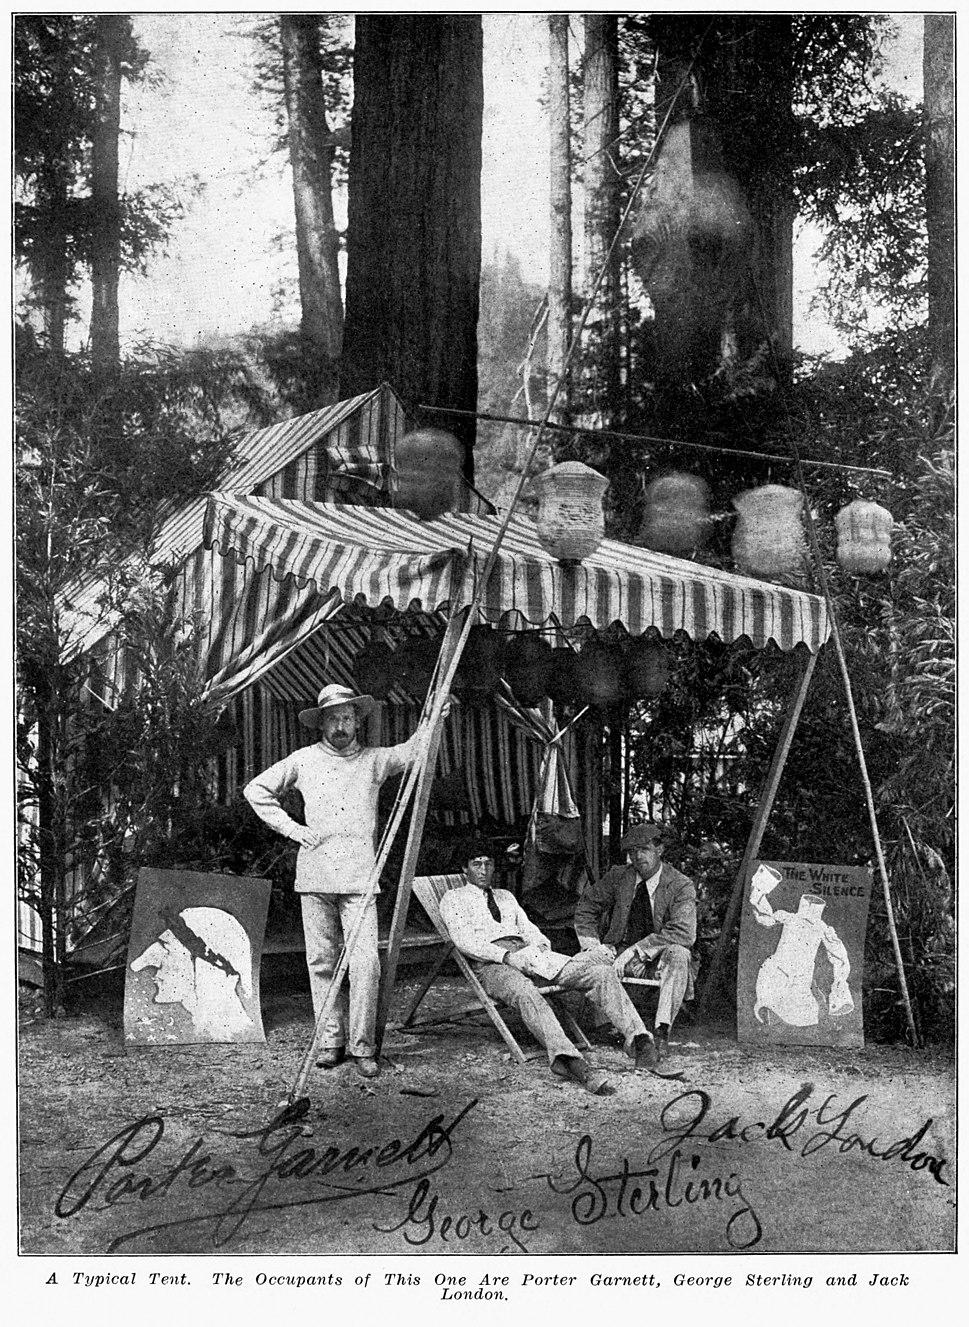 Bohemian Grove Camp - Garnett, Sterling, London